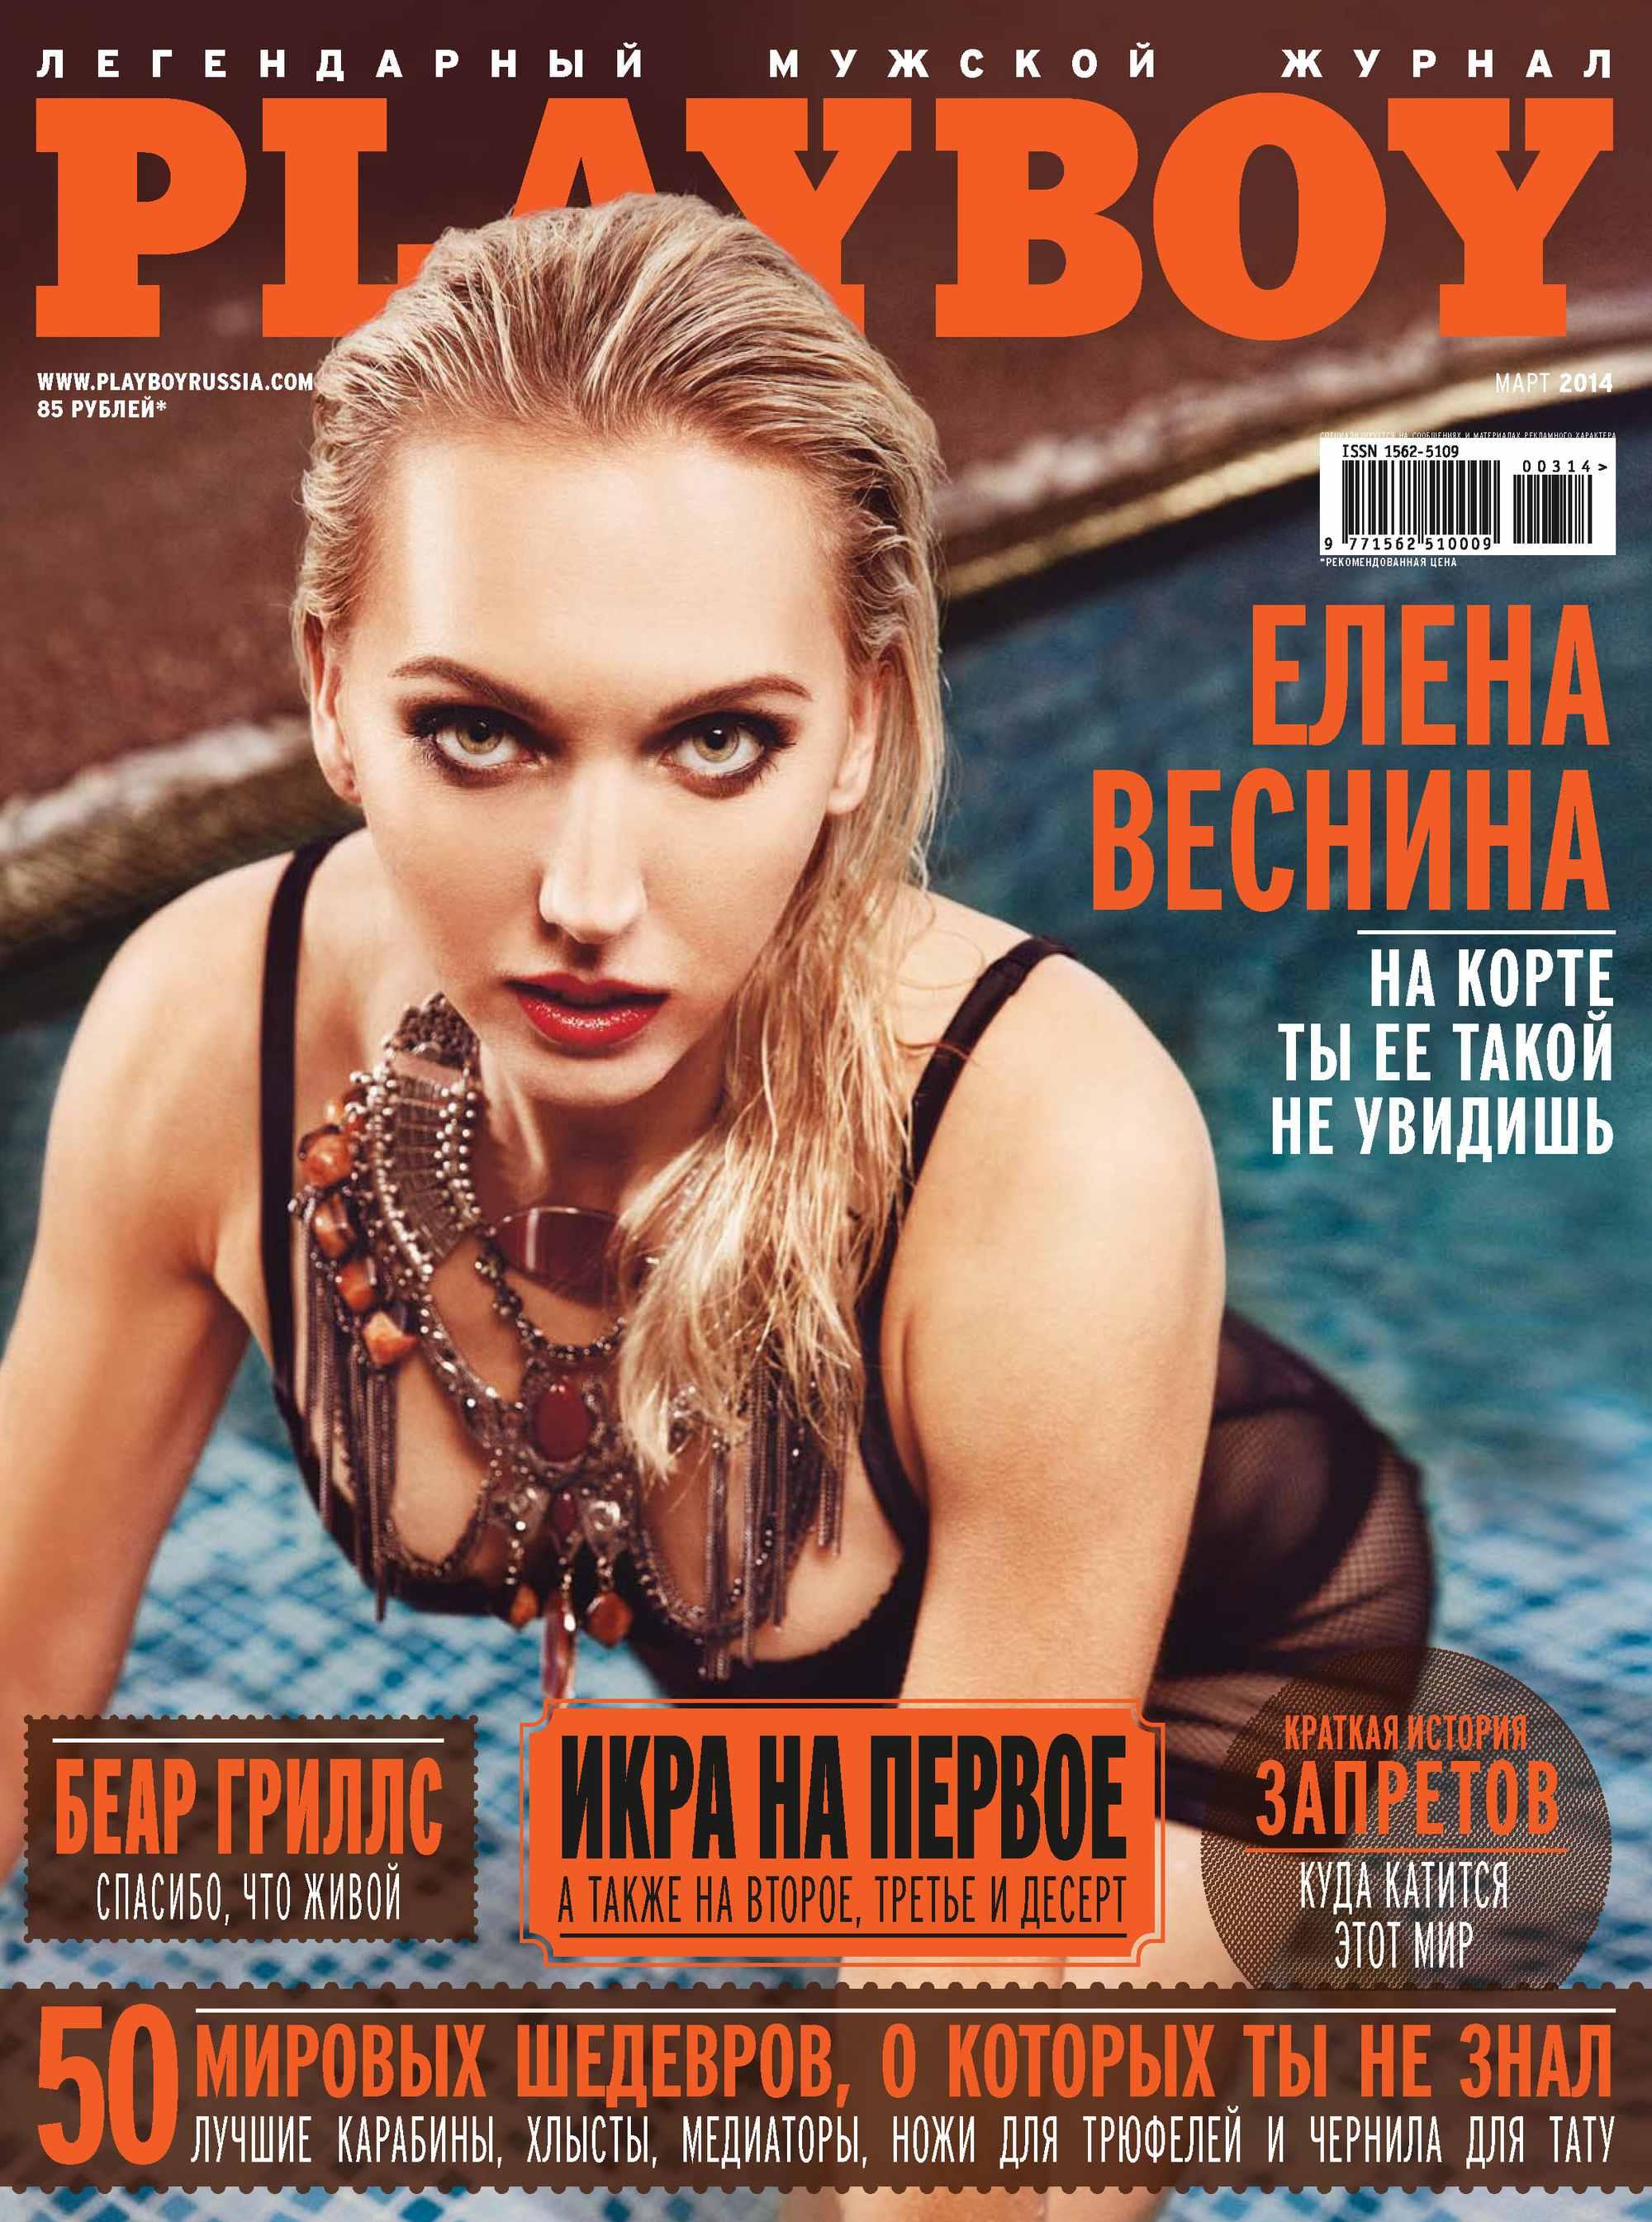 Playboy№03/2014